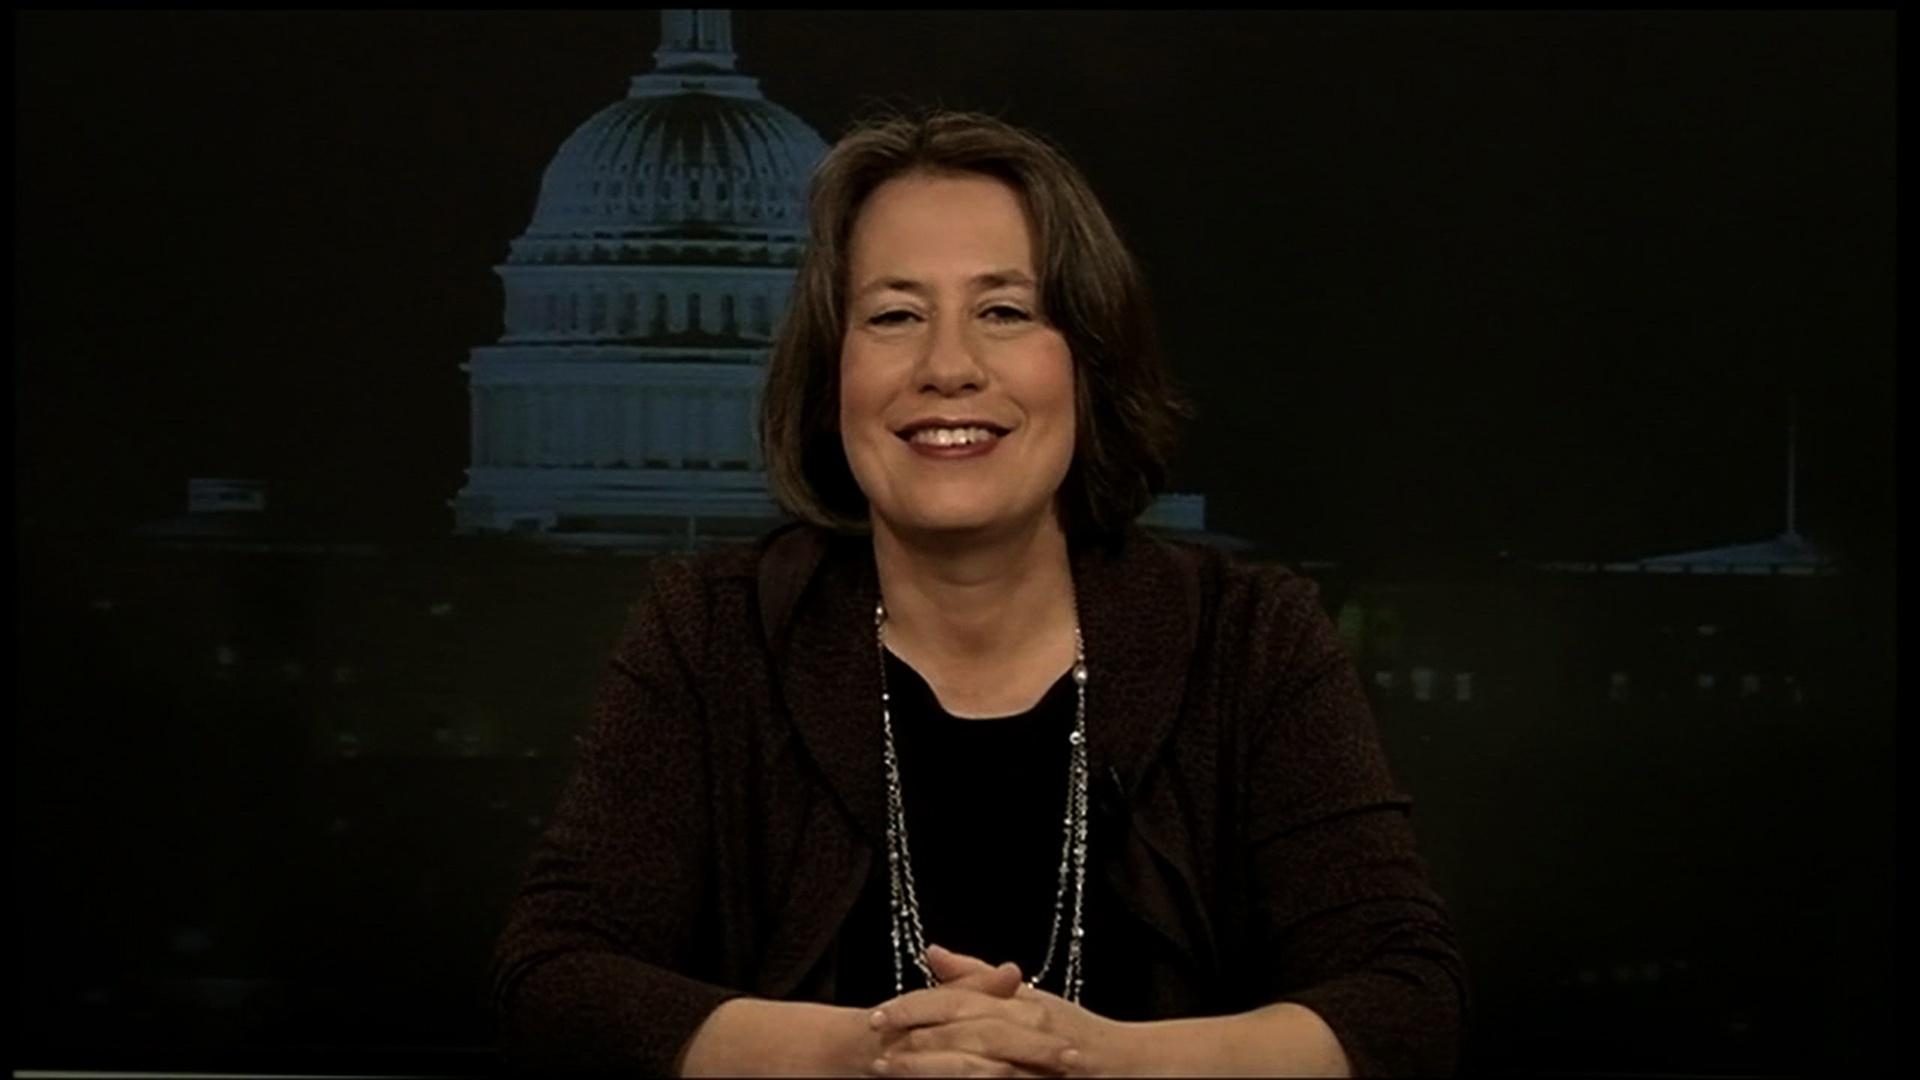 Former FDIC chair SheilaBair image